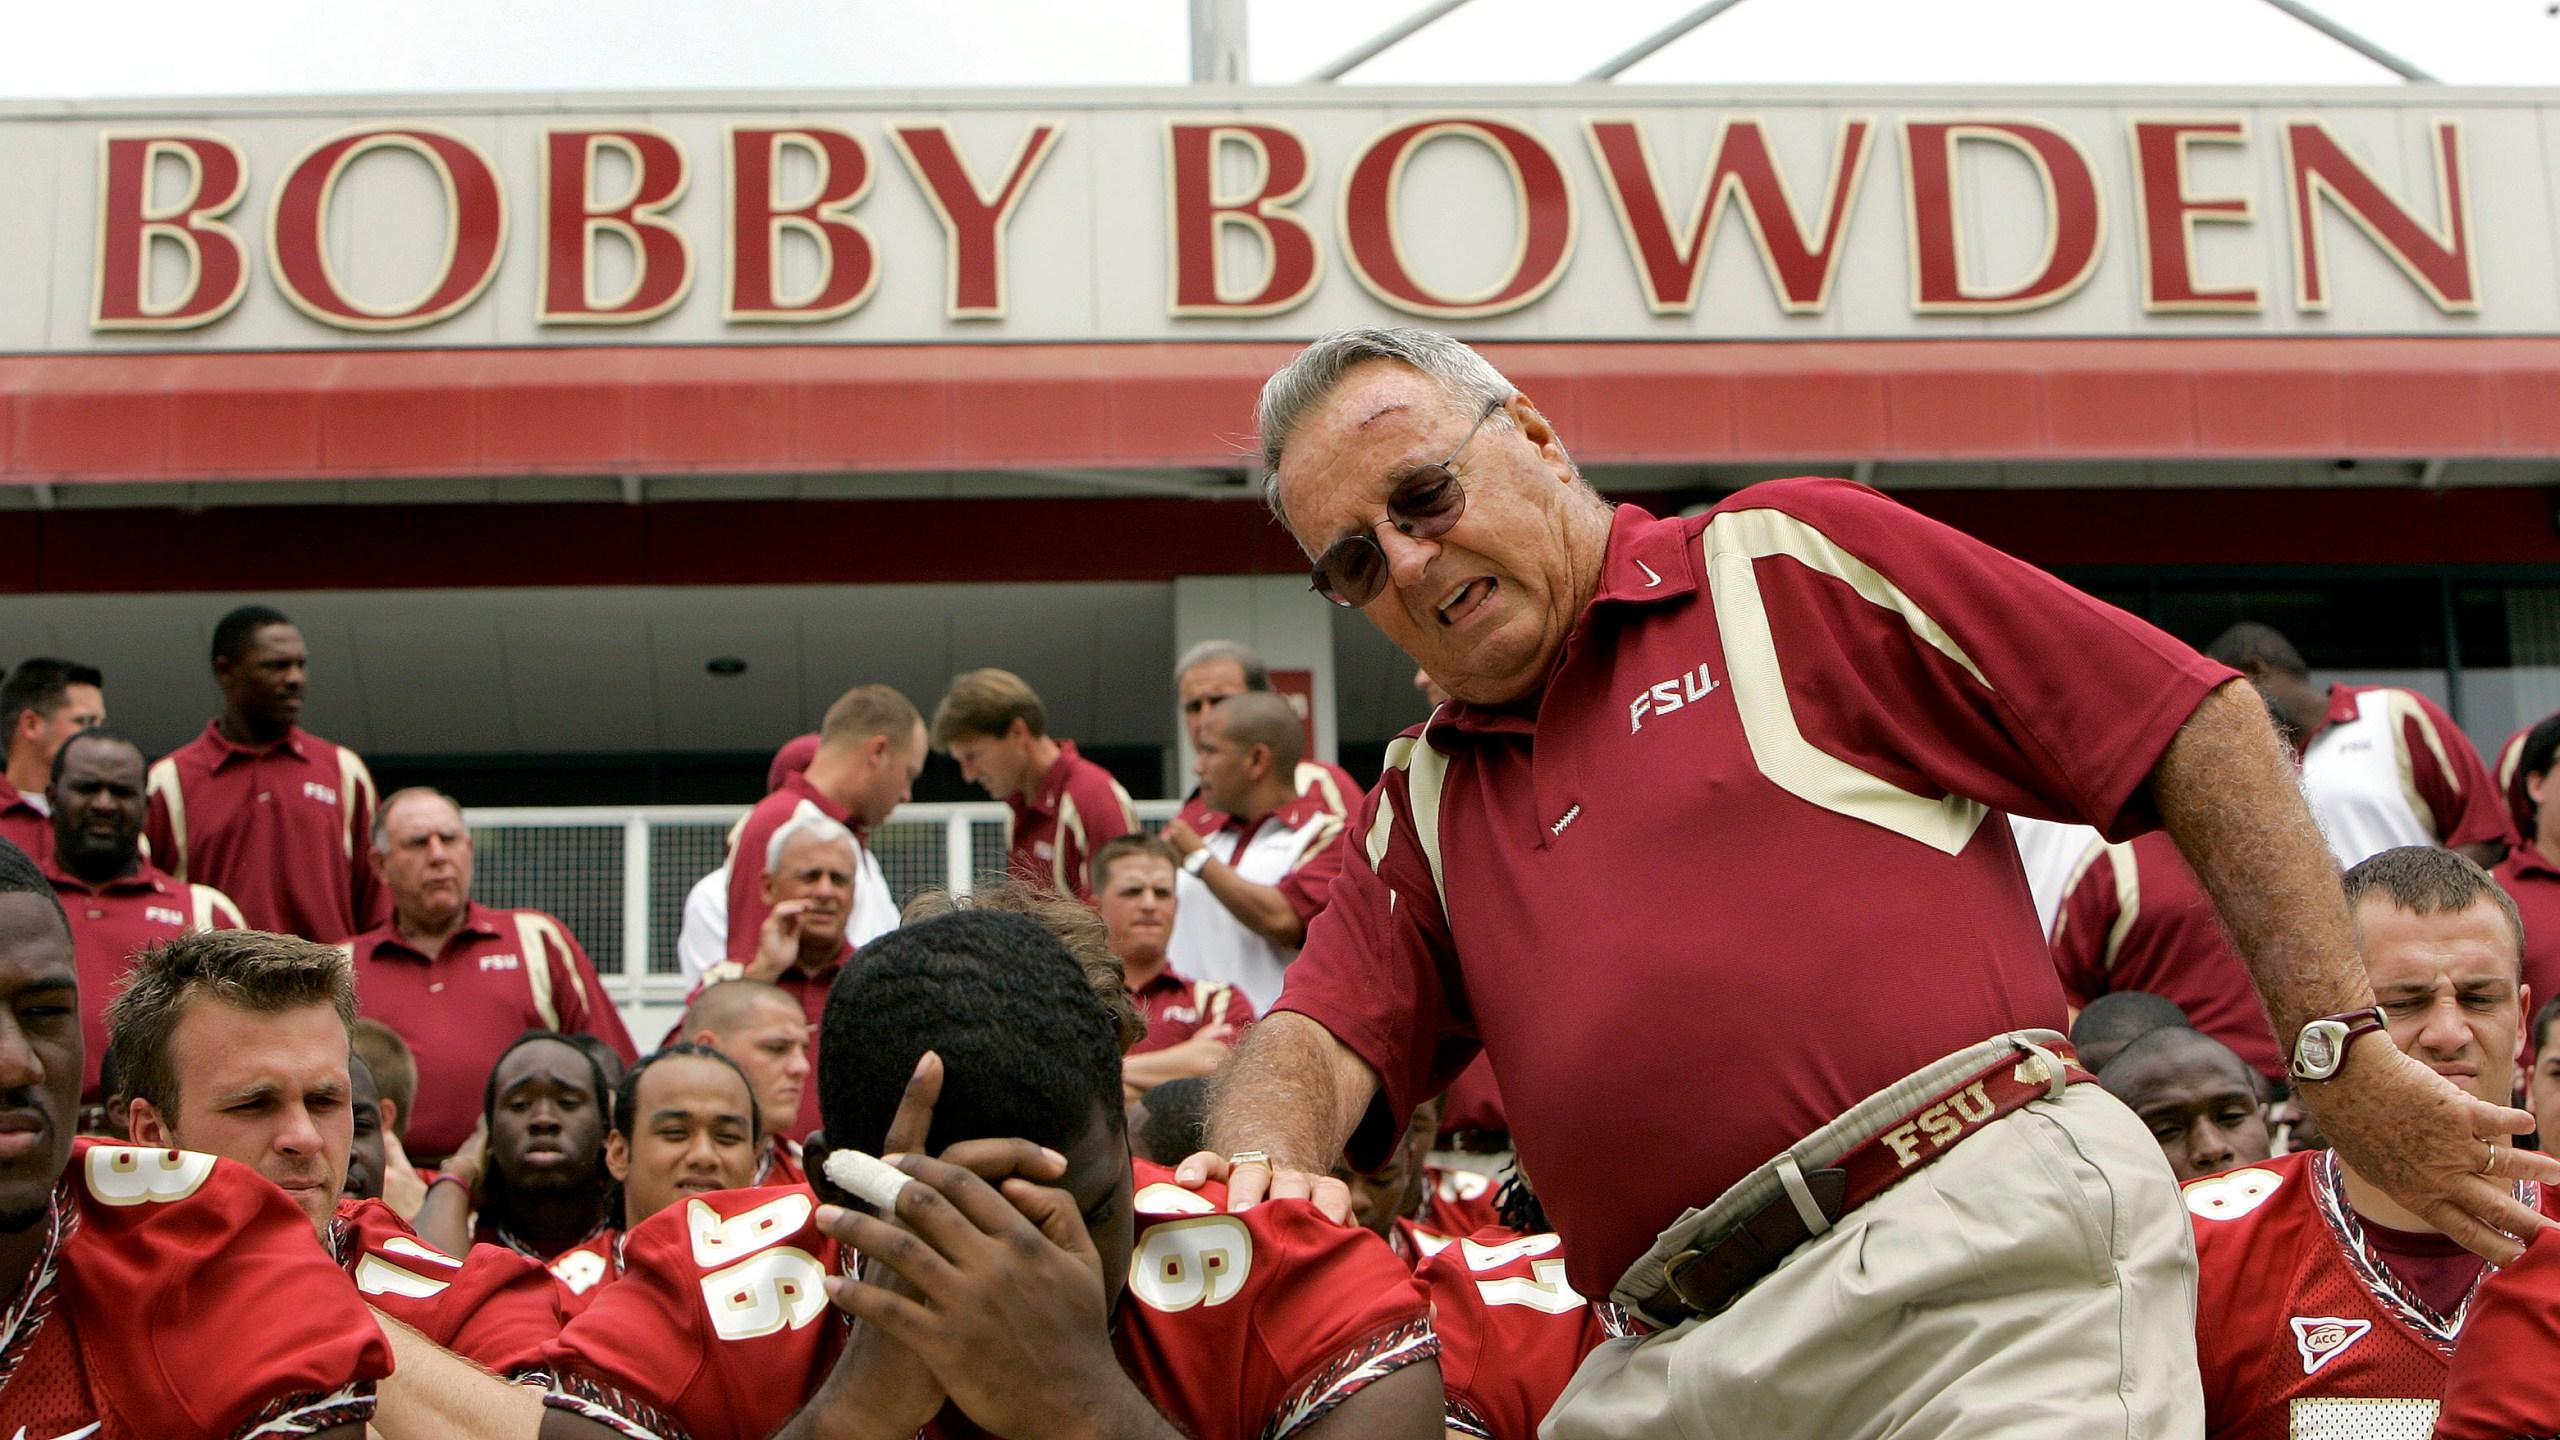 Bobby Bowden